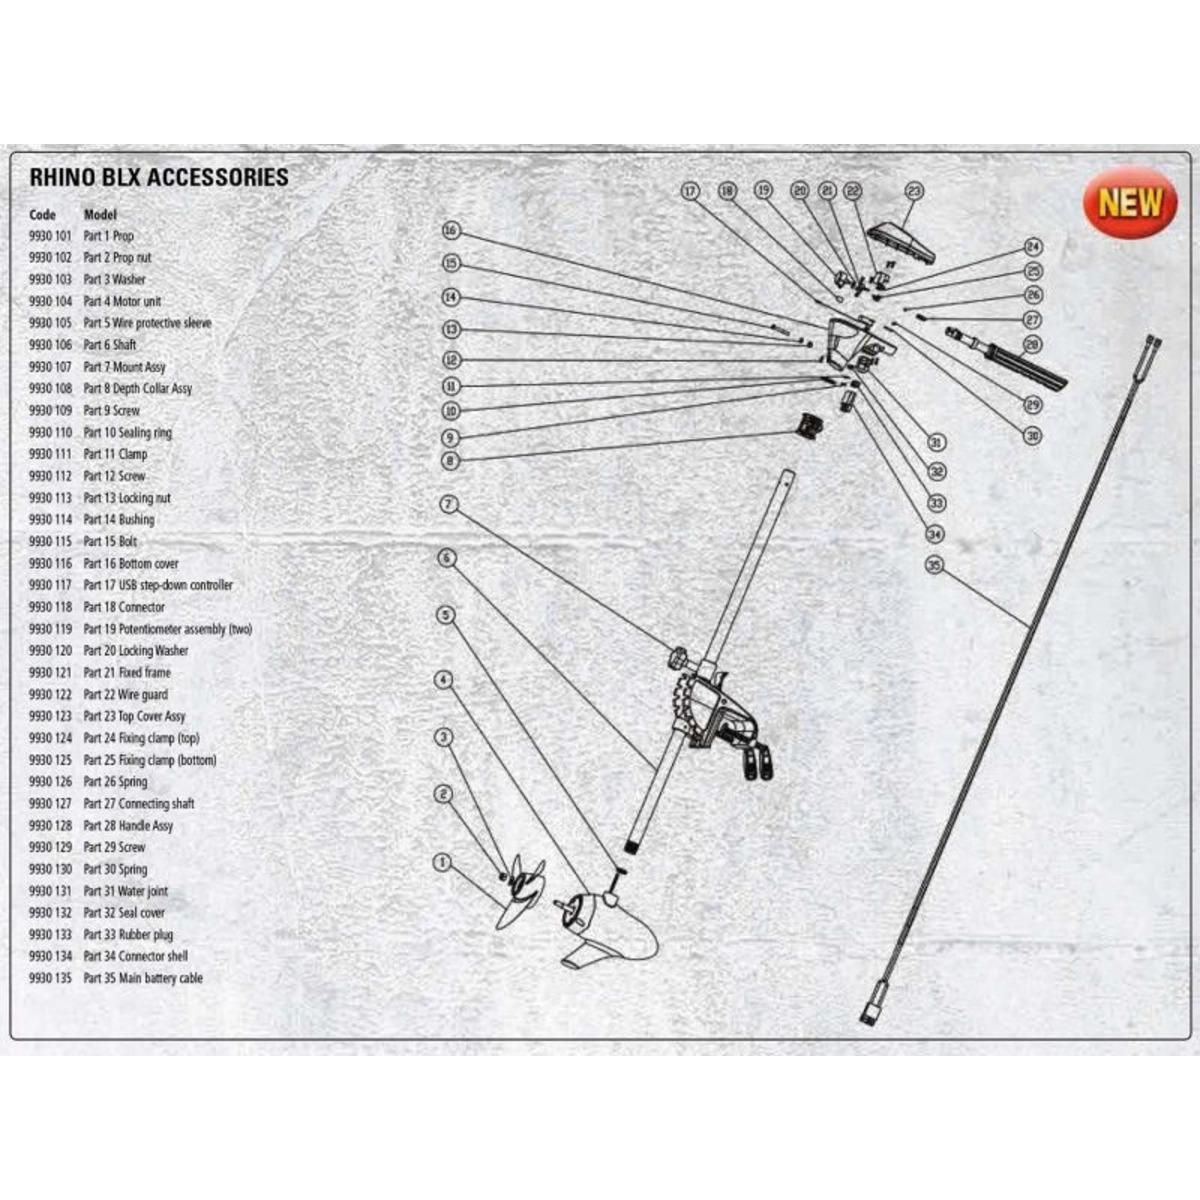 Rhino Feder für Elektromotore BLX 70 - Teil 30